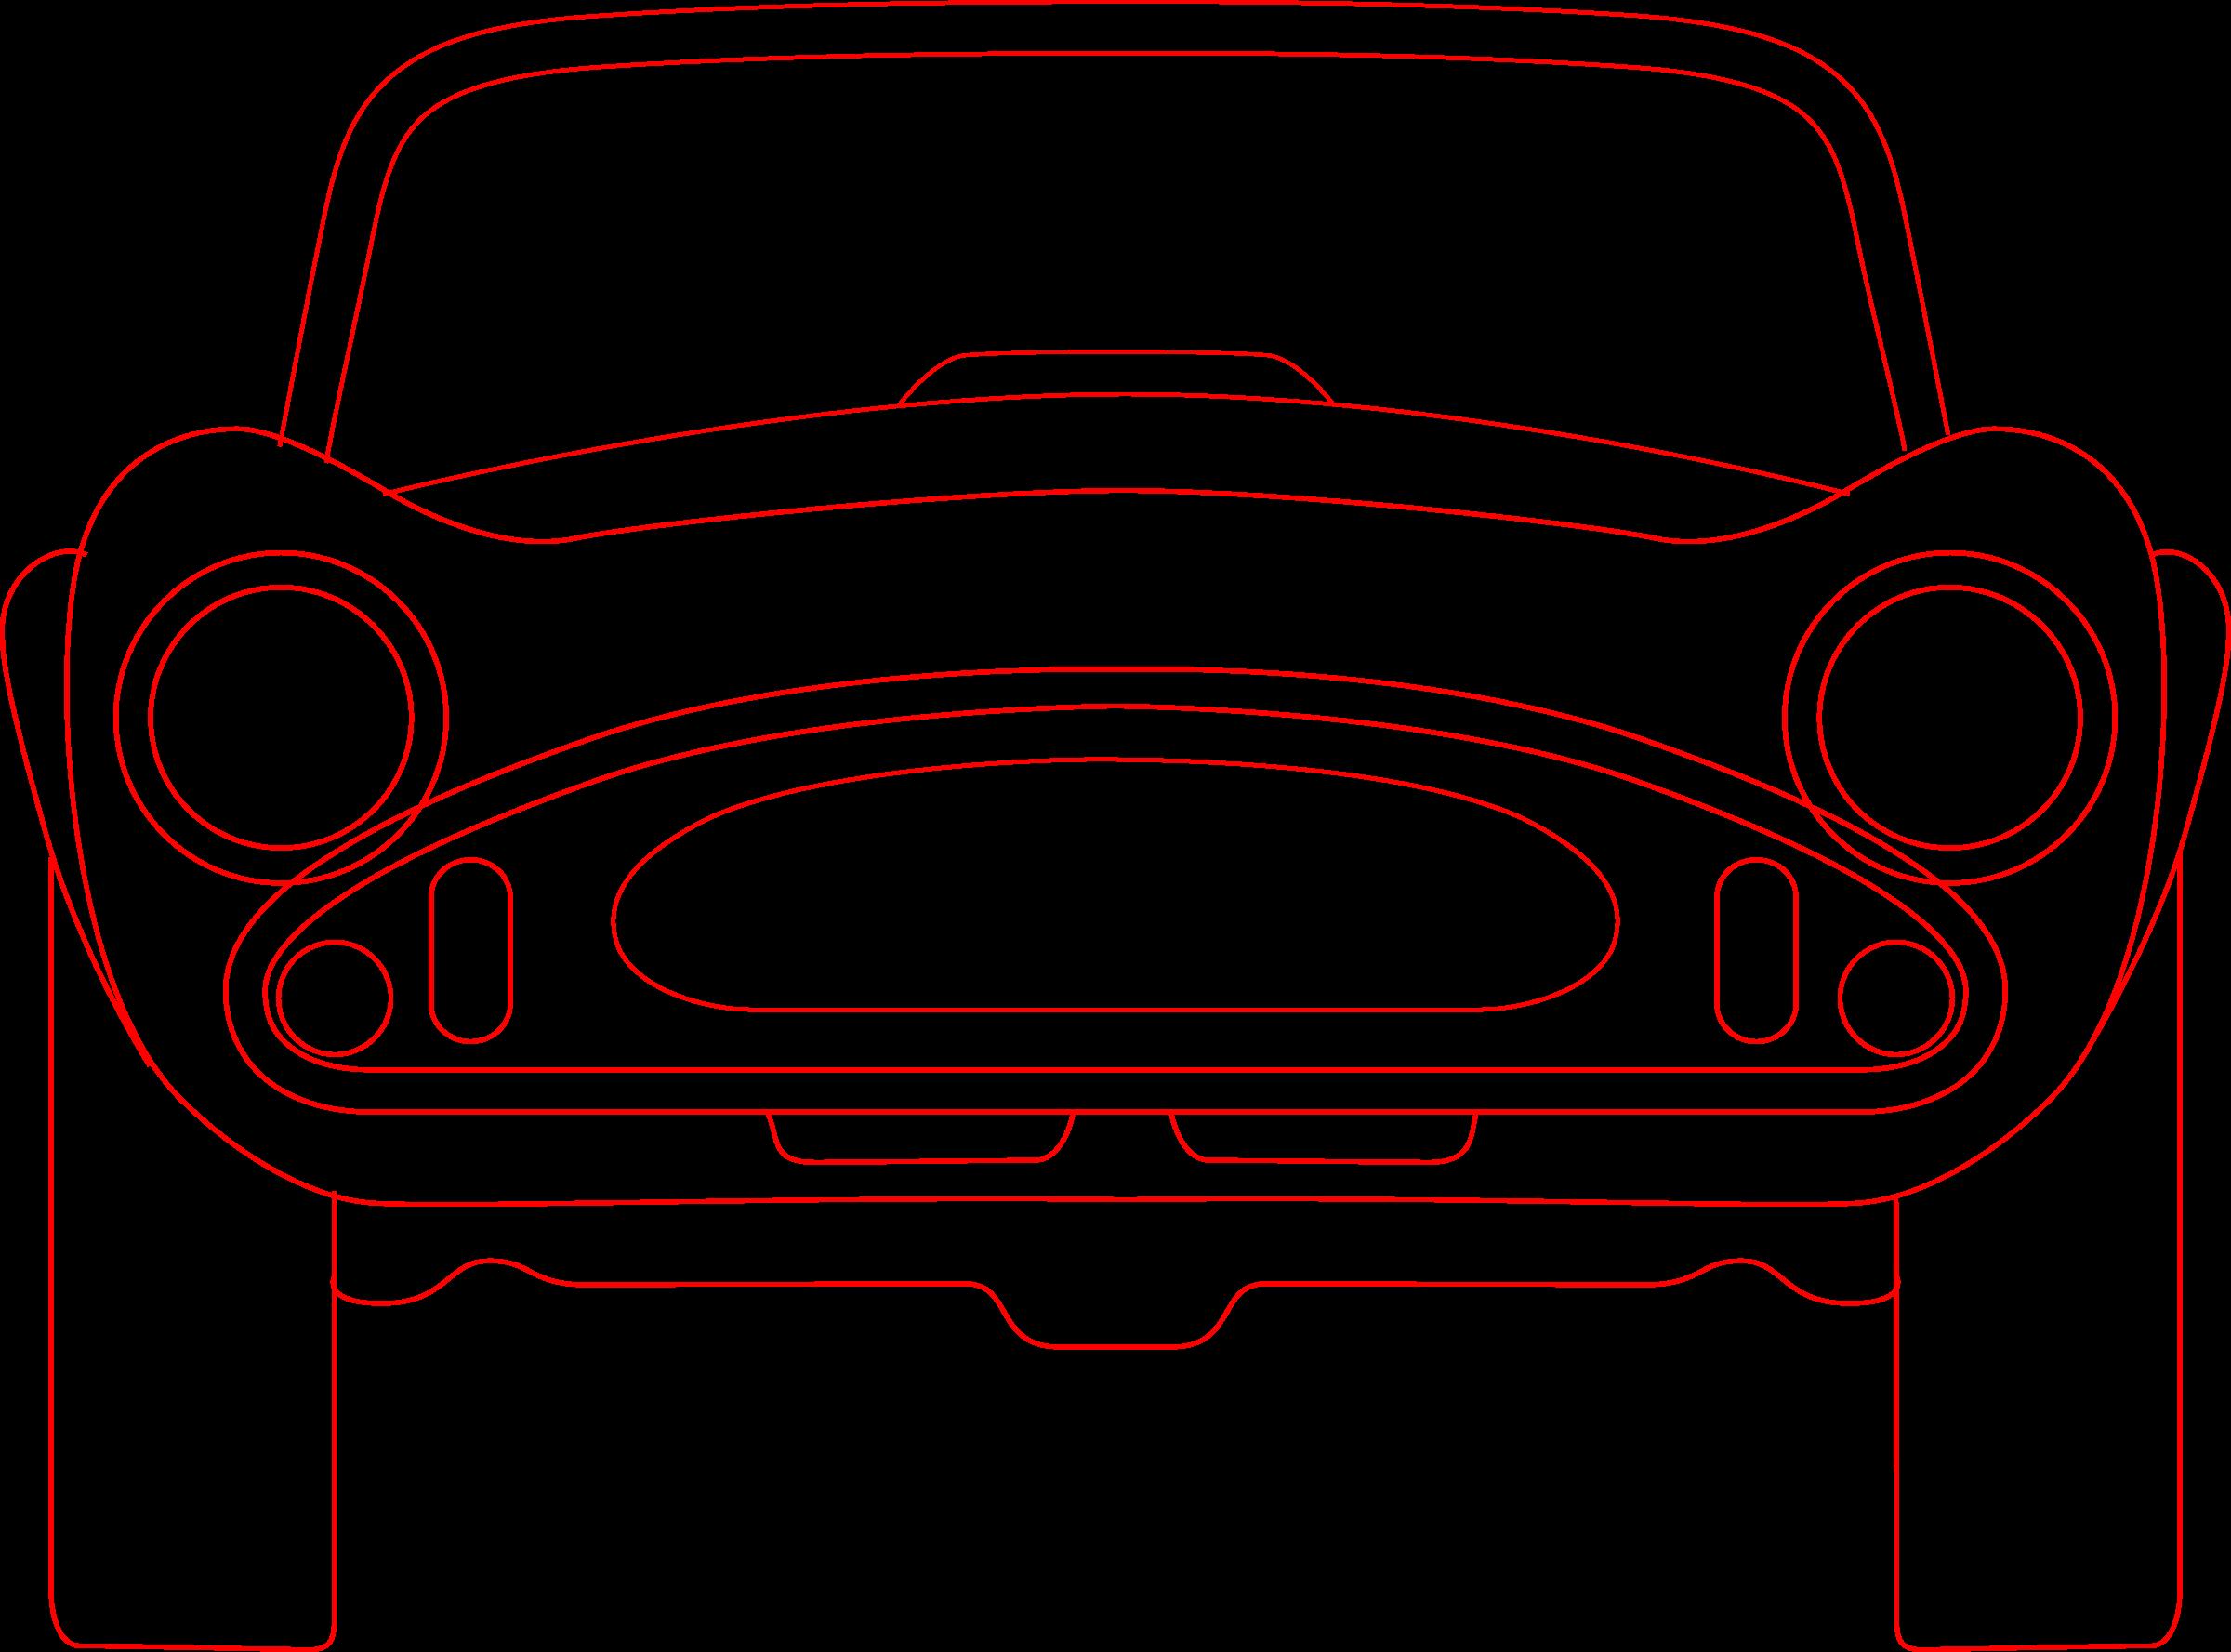 Cobra clipart svg. Shelby blueprint big image